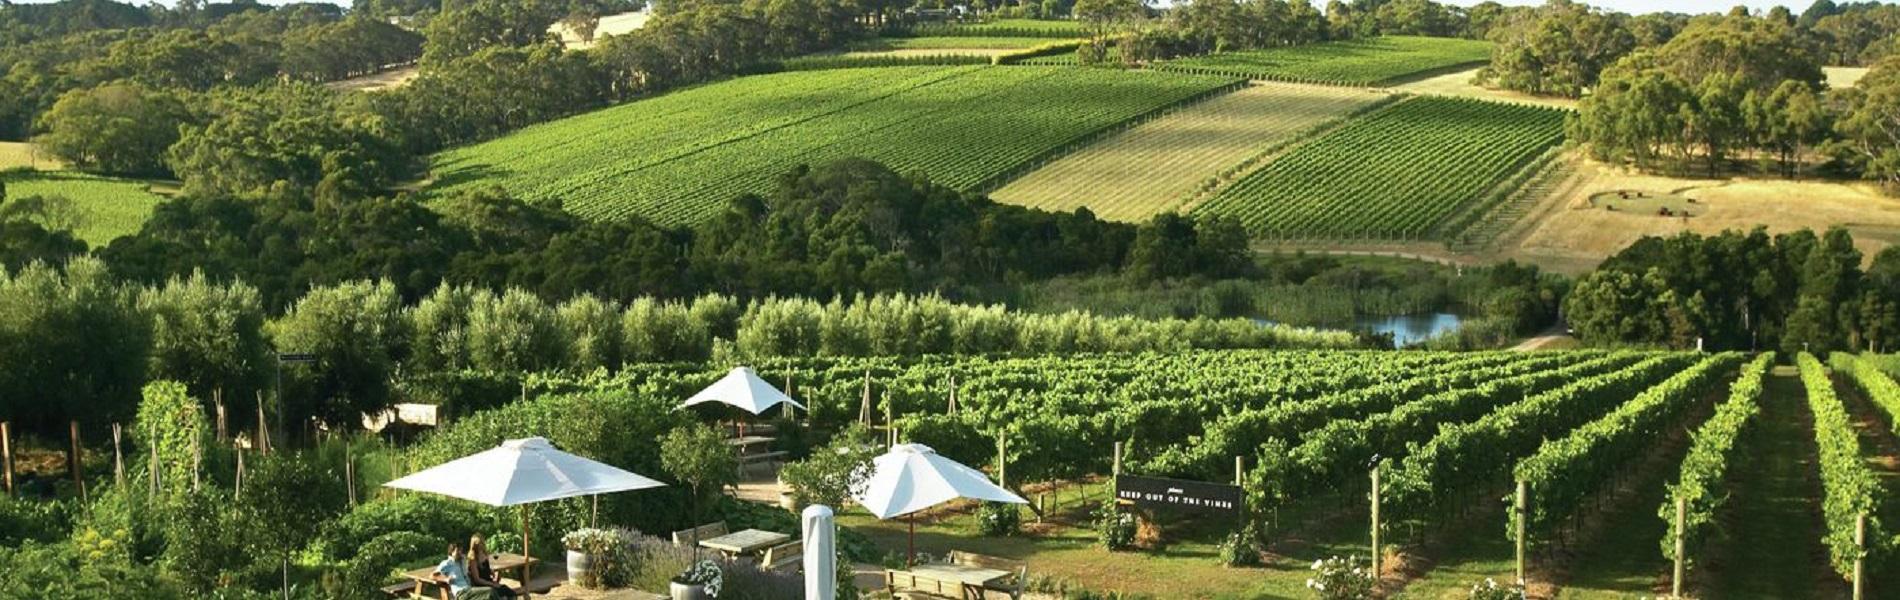 Mornington Valley Wine Tours